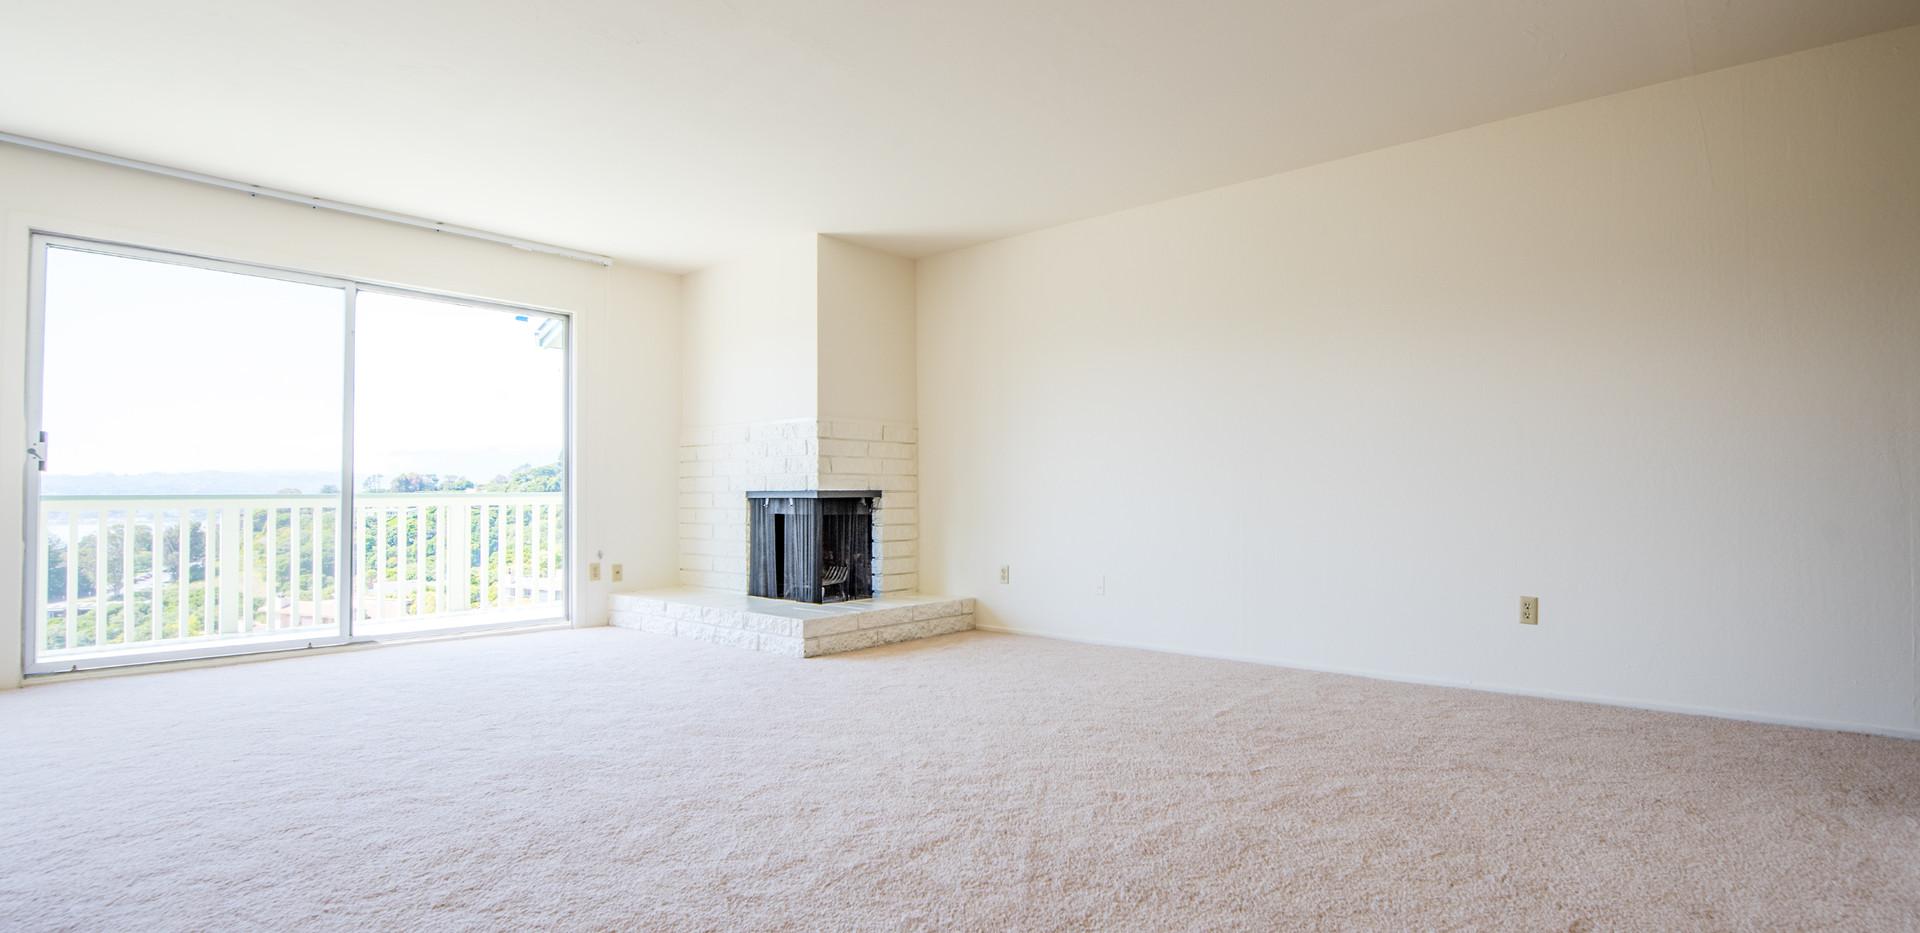 21 Marinero 305 Living Room.jpg